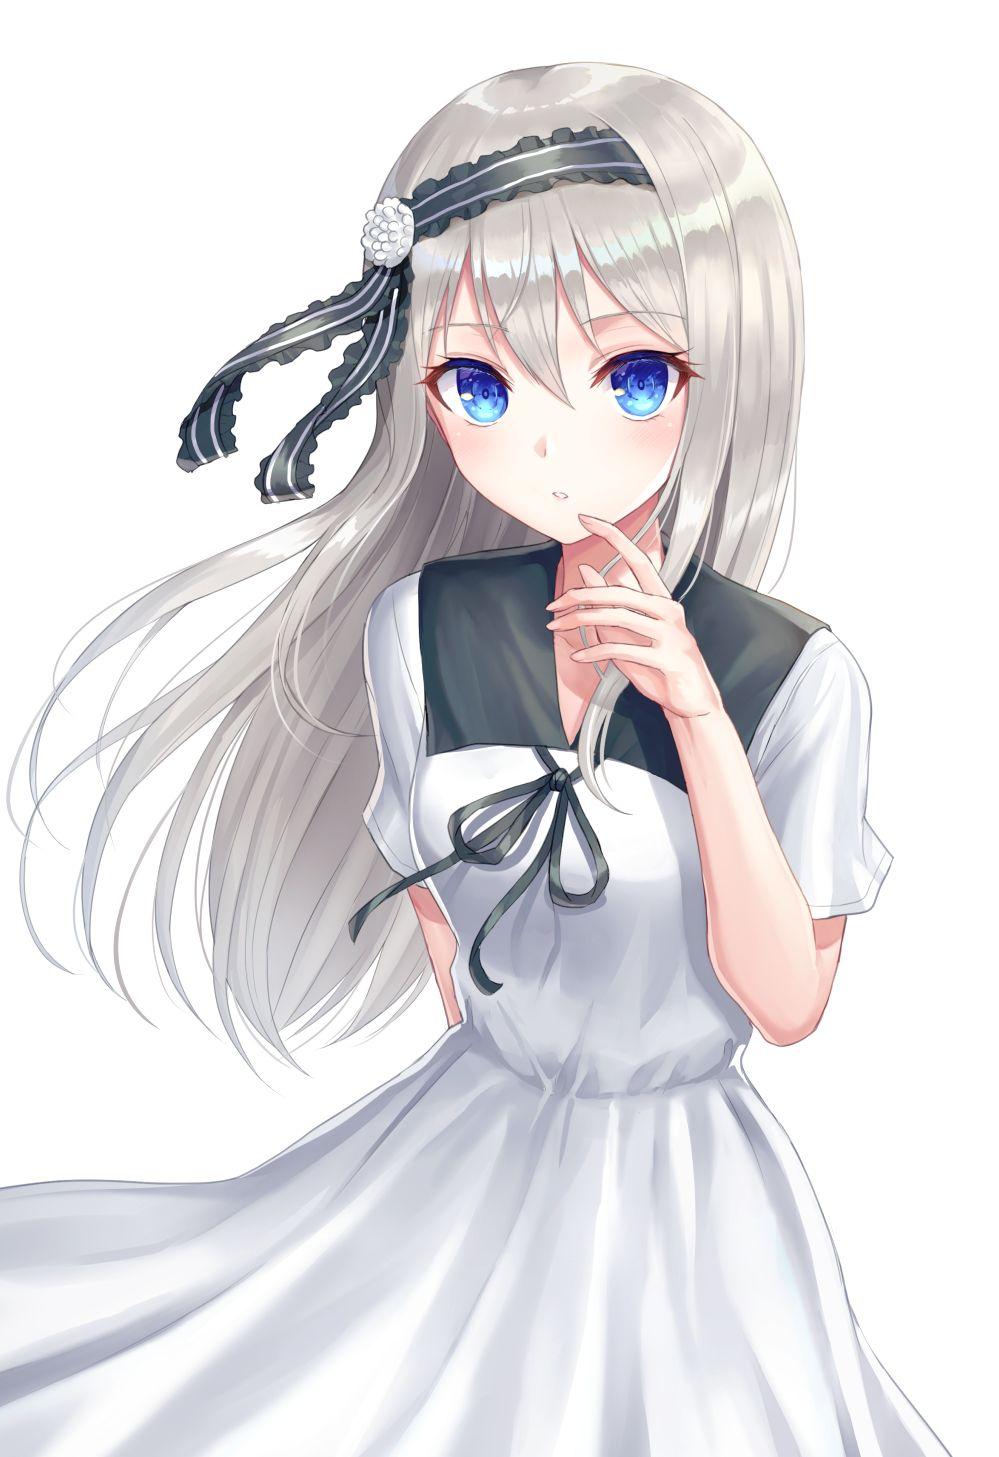 Kei Shirogane Kaguya Sama Di 2020 Gadis Animasi Gambar Karakter Gambar Anime